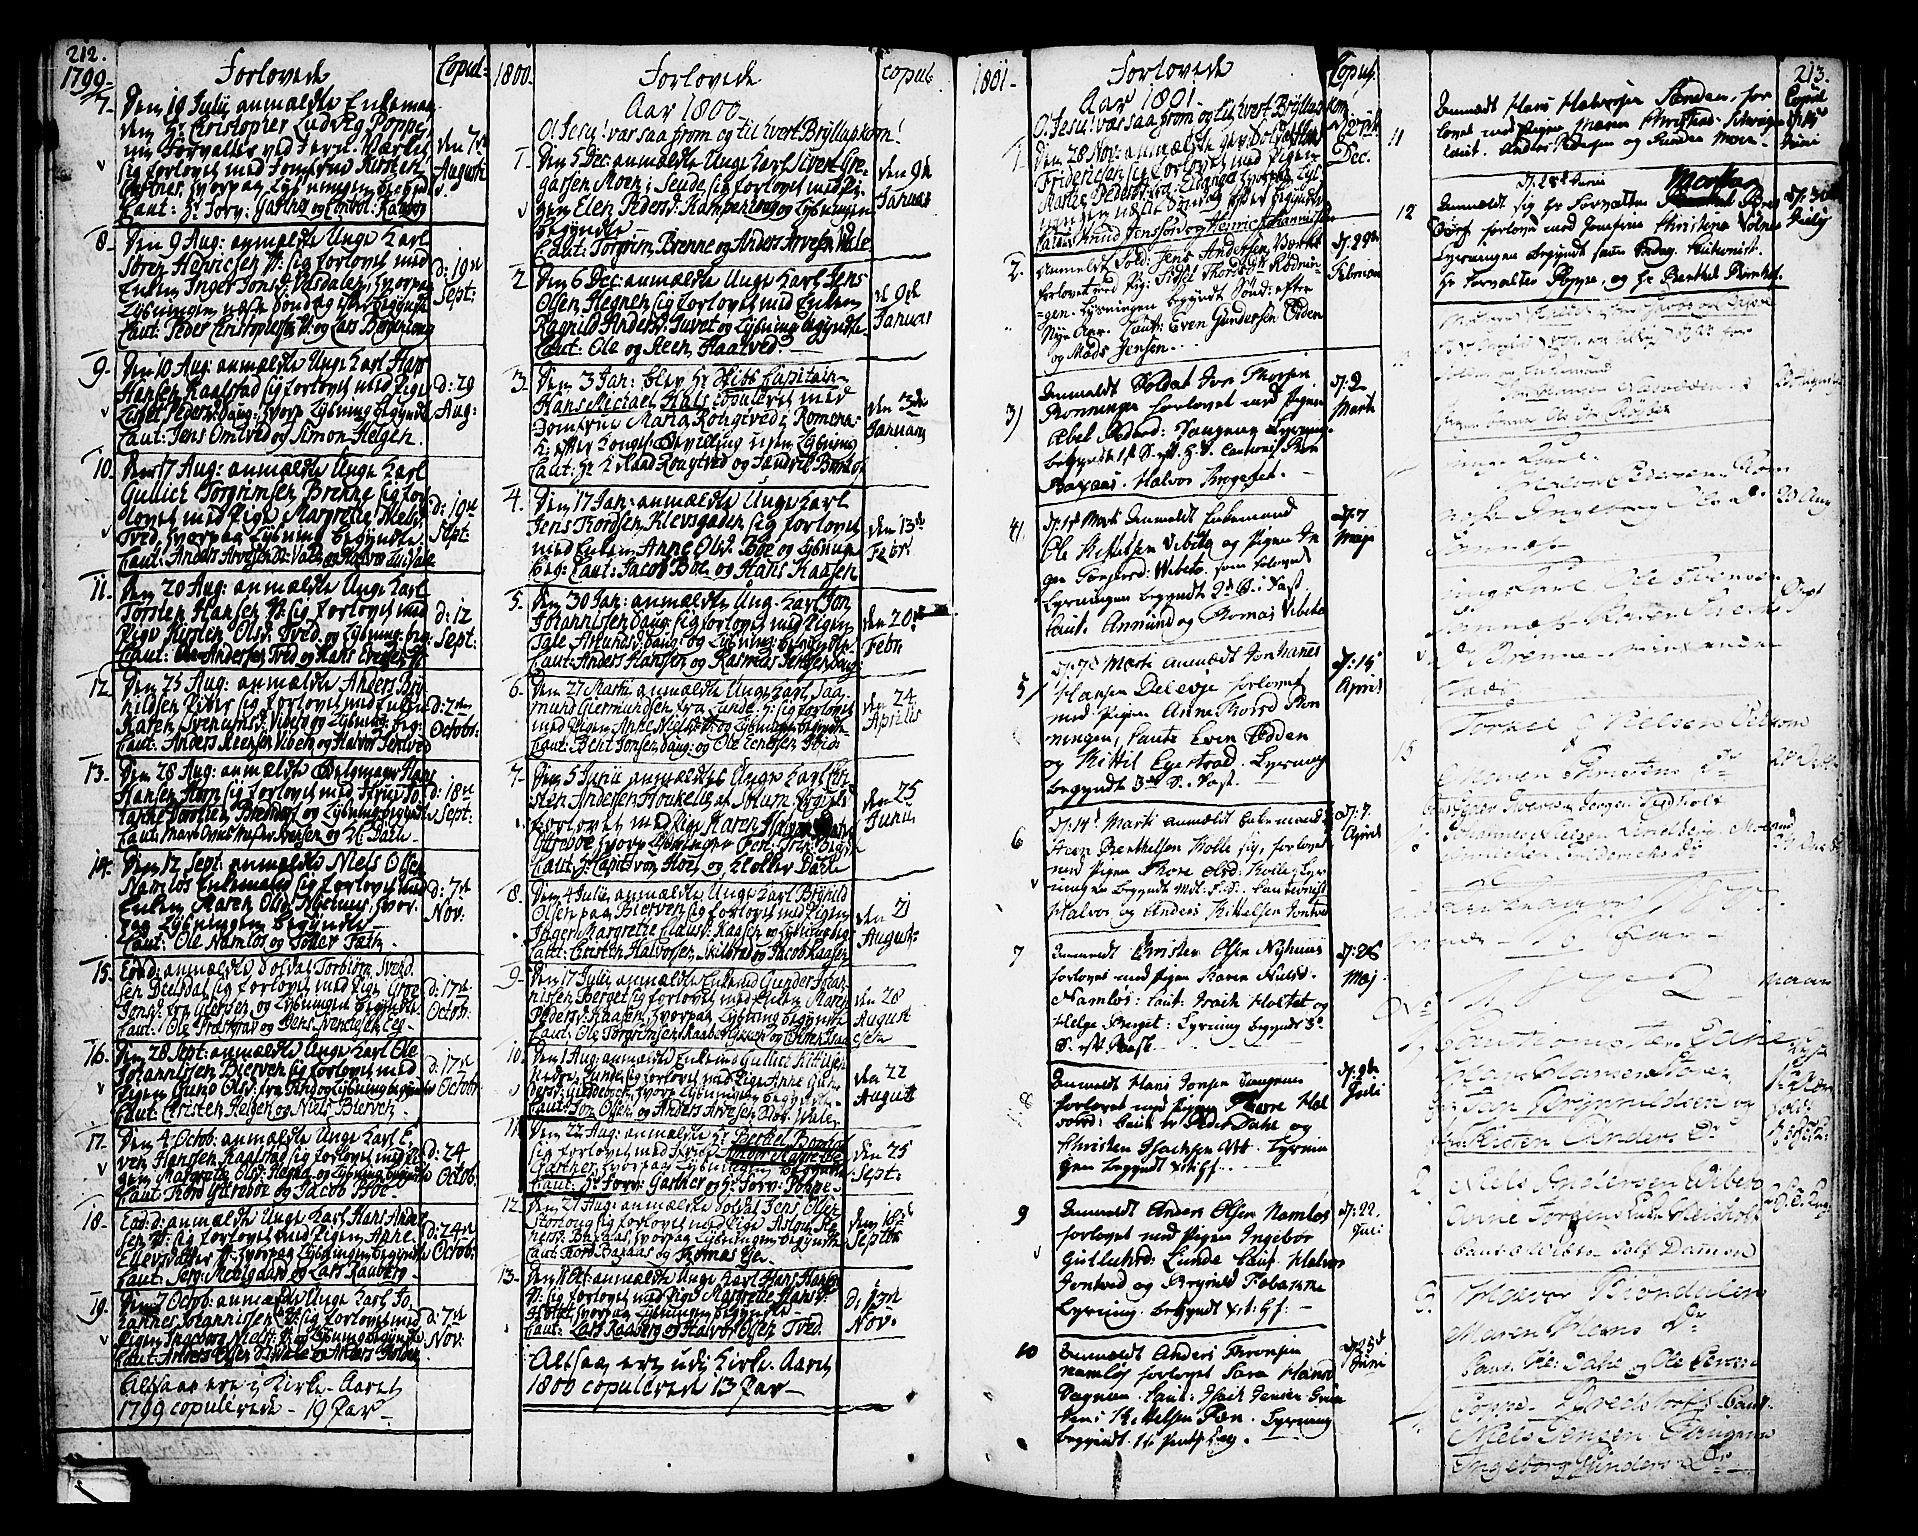 SAKO, Holla kirkebøker, F/Fa/L0002: Ministerialbok nr. 2, 1779-1814, s. 212-213